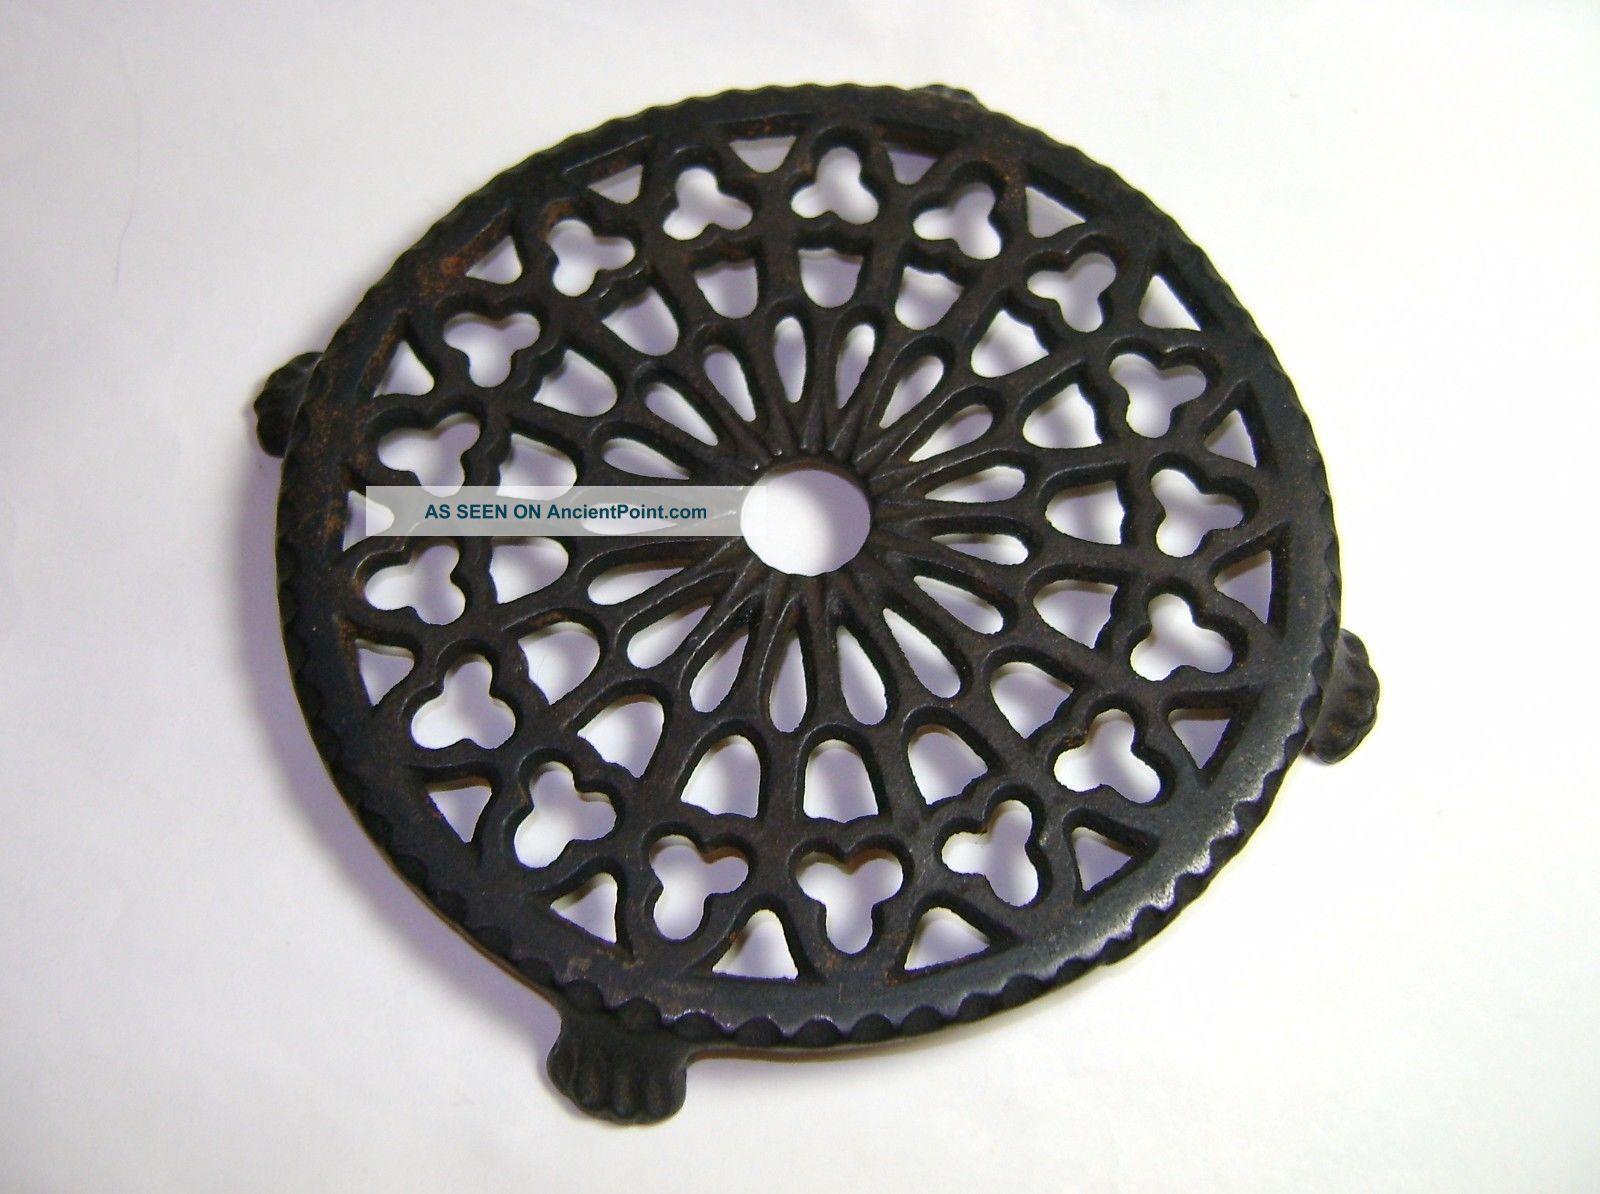 Antique Round Ornate Cast Iron Footed Vintage Trivet Perfect For Primitive Decor Trivets photo